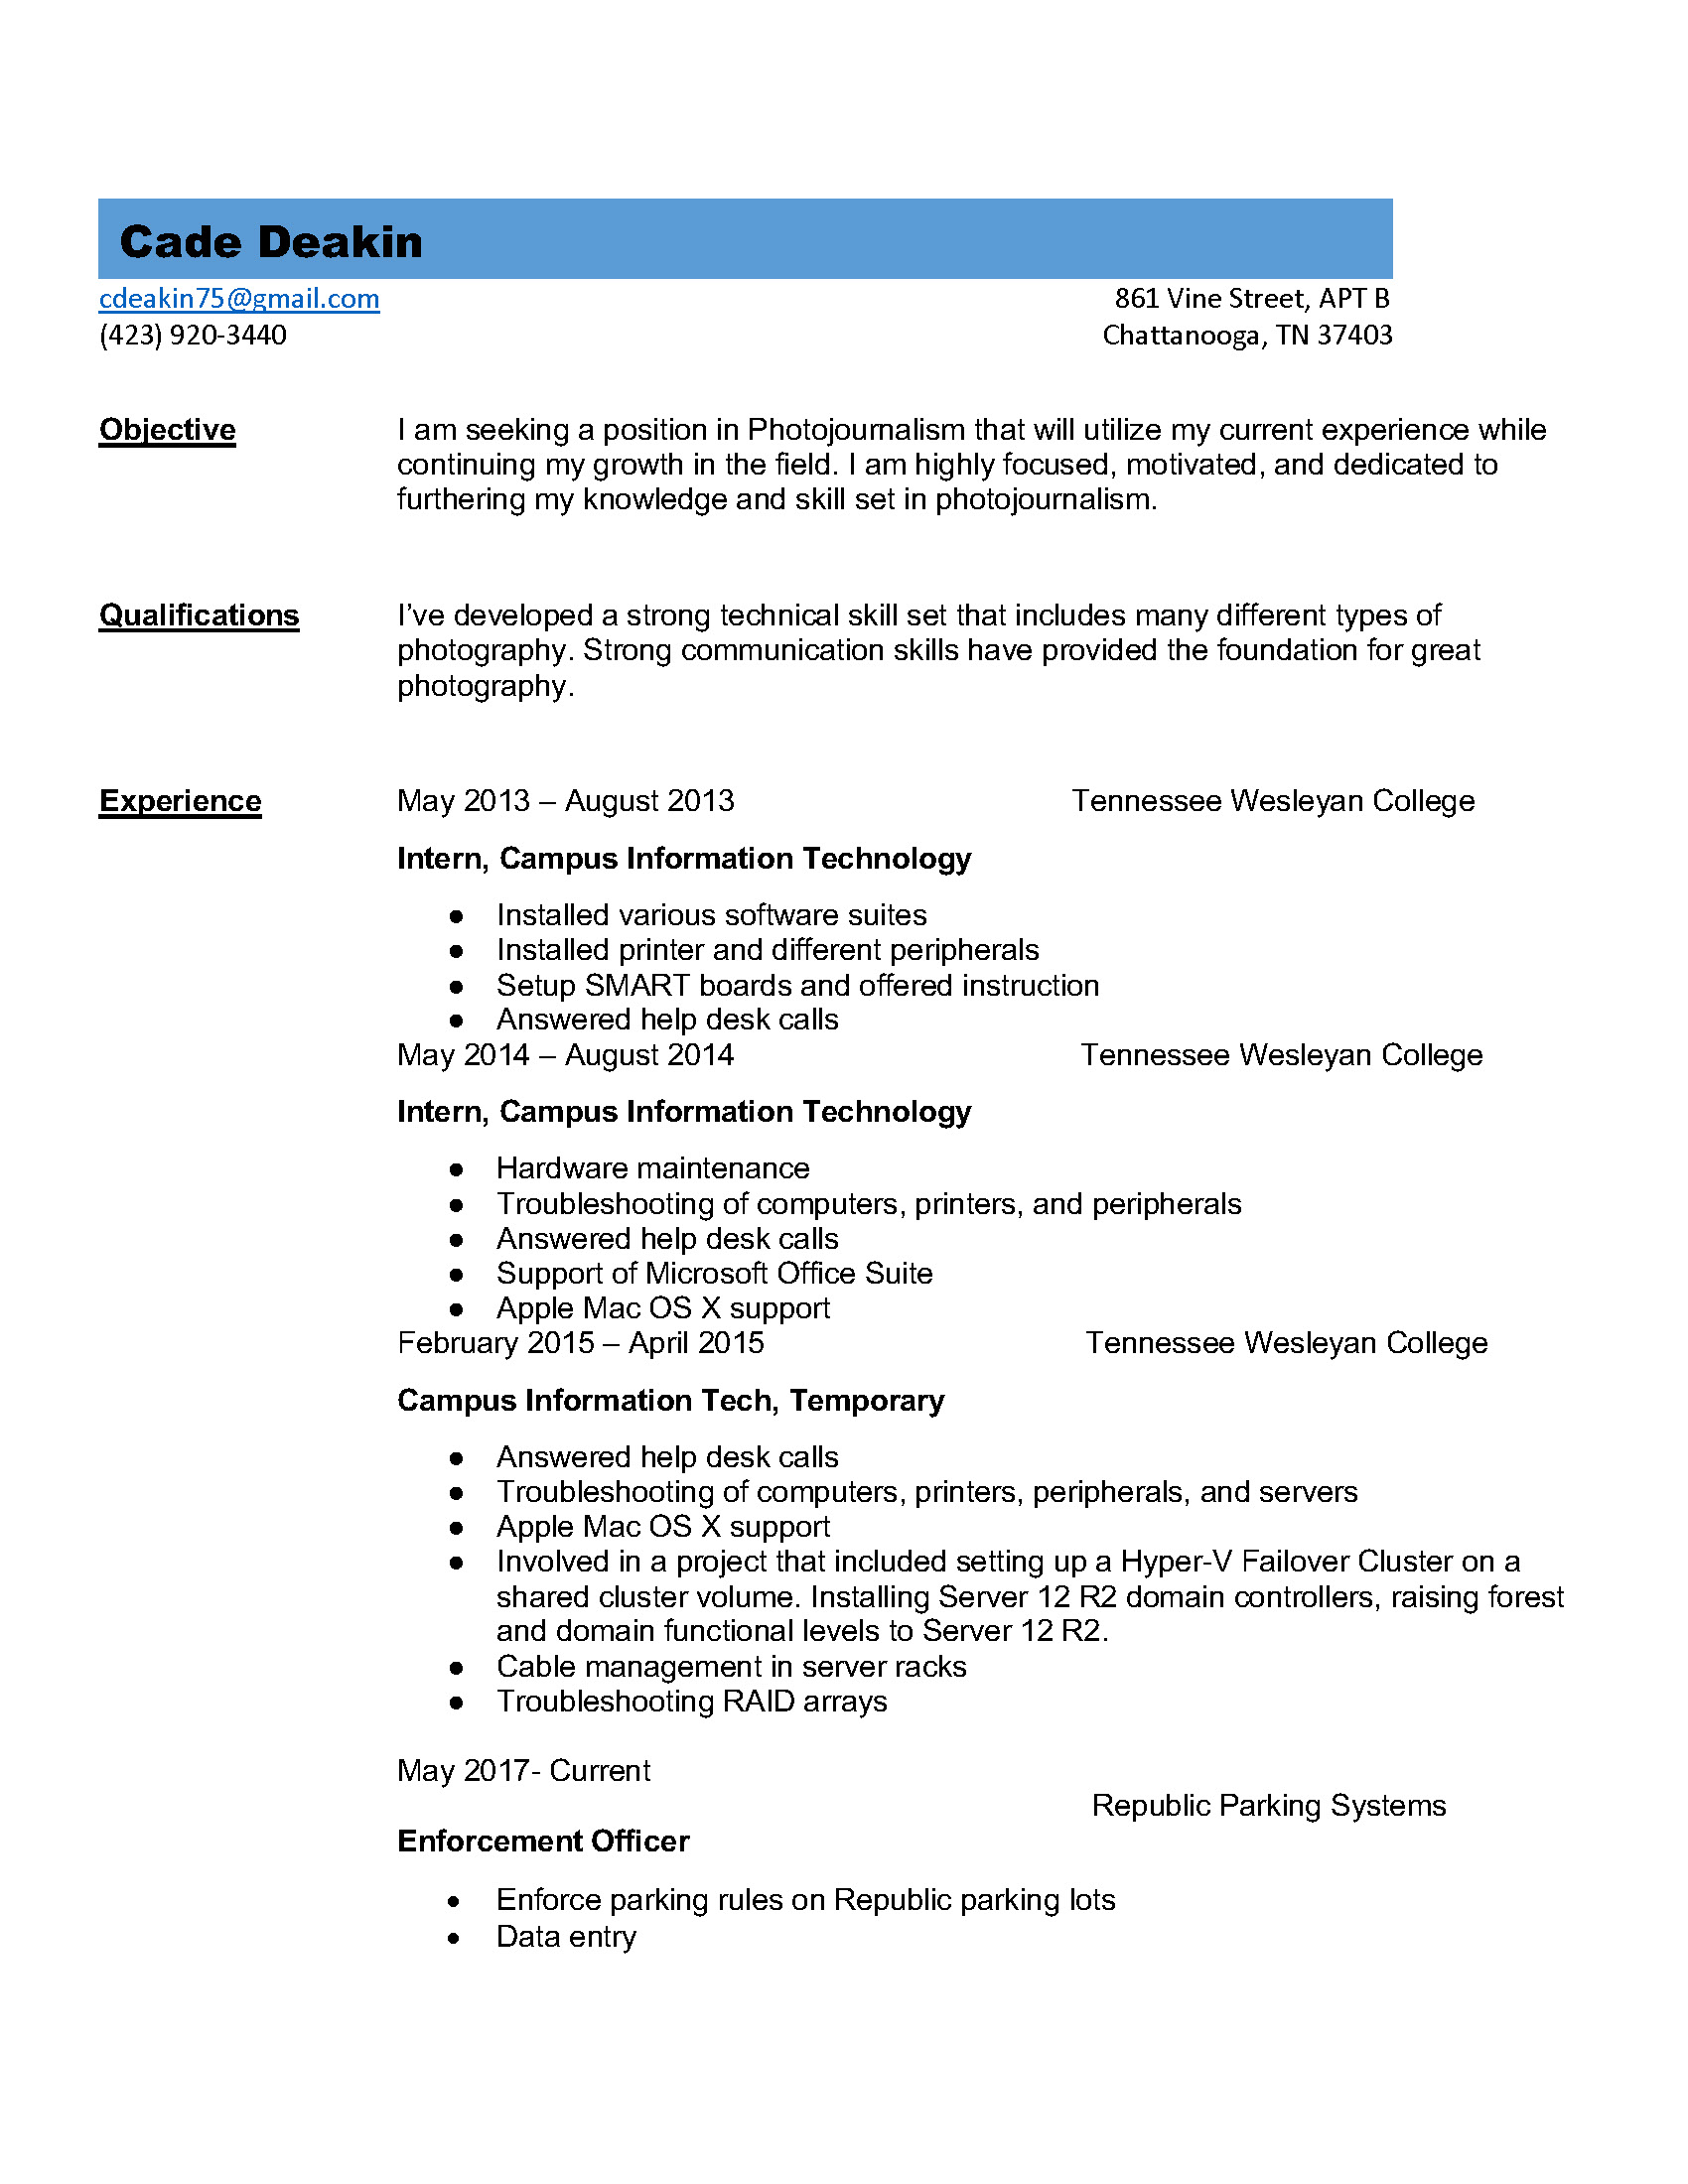 Resume 7.18.2018_Page_1.jpg